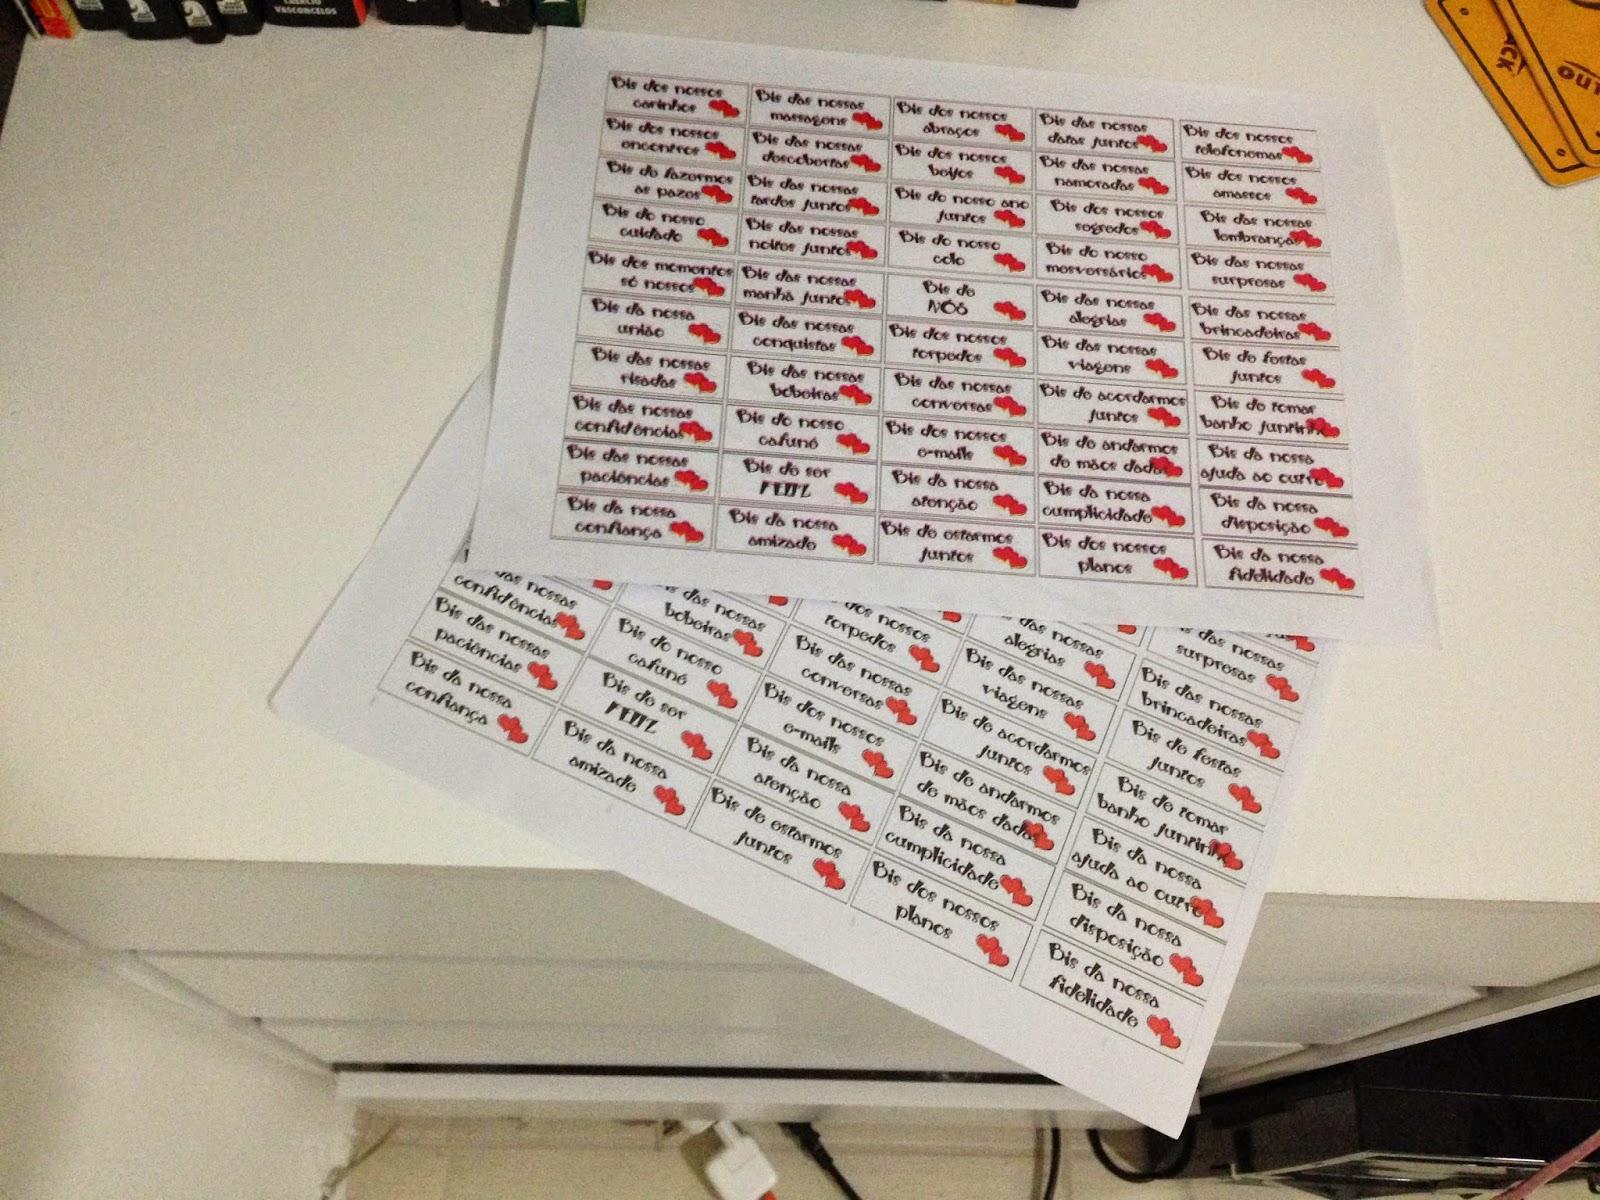 365 Motivos Pra Te Amar Pronto Para Imprimir Wood Scribd Braxin